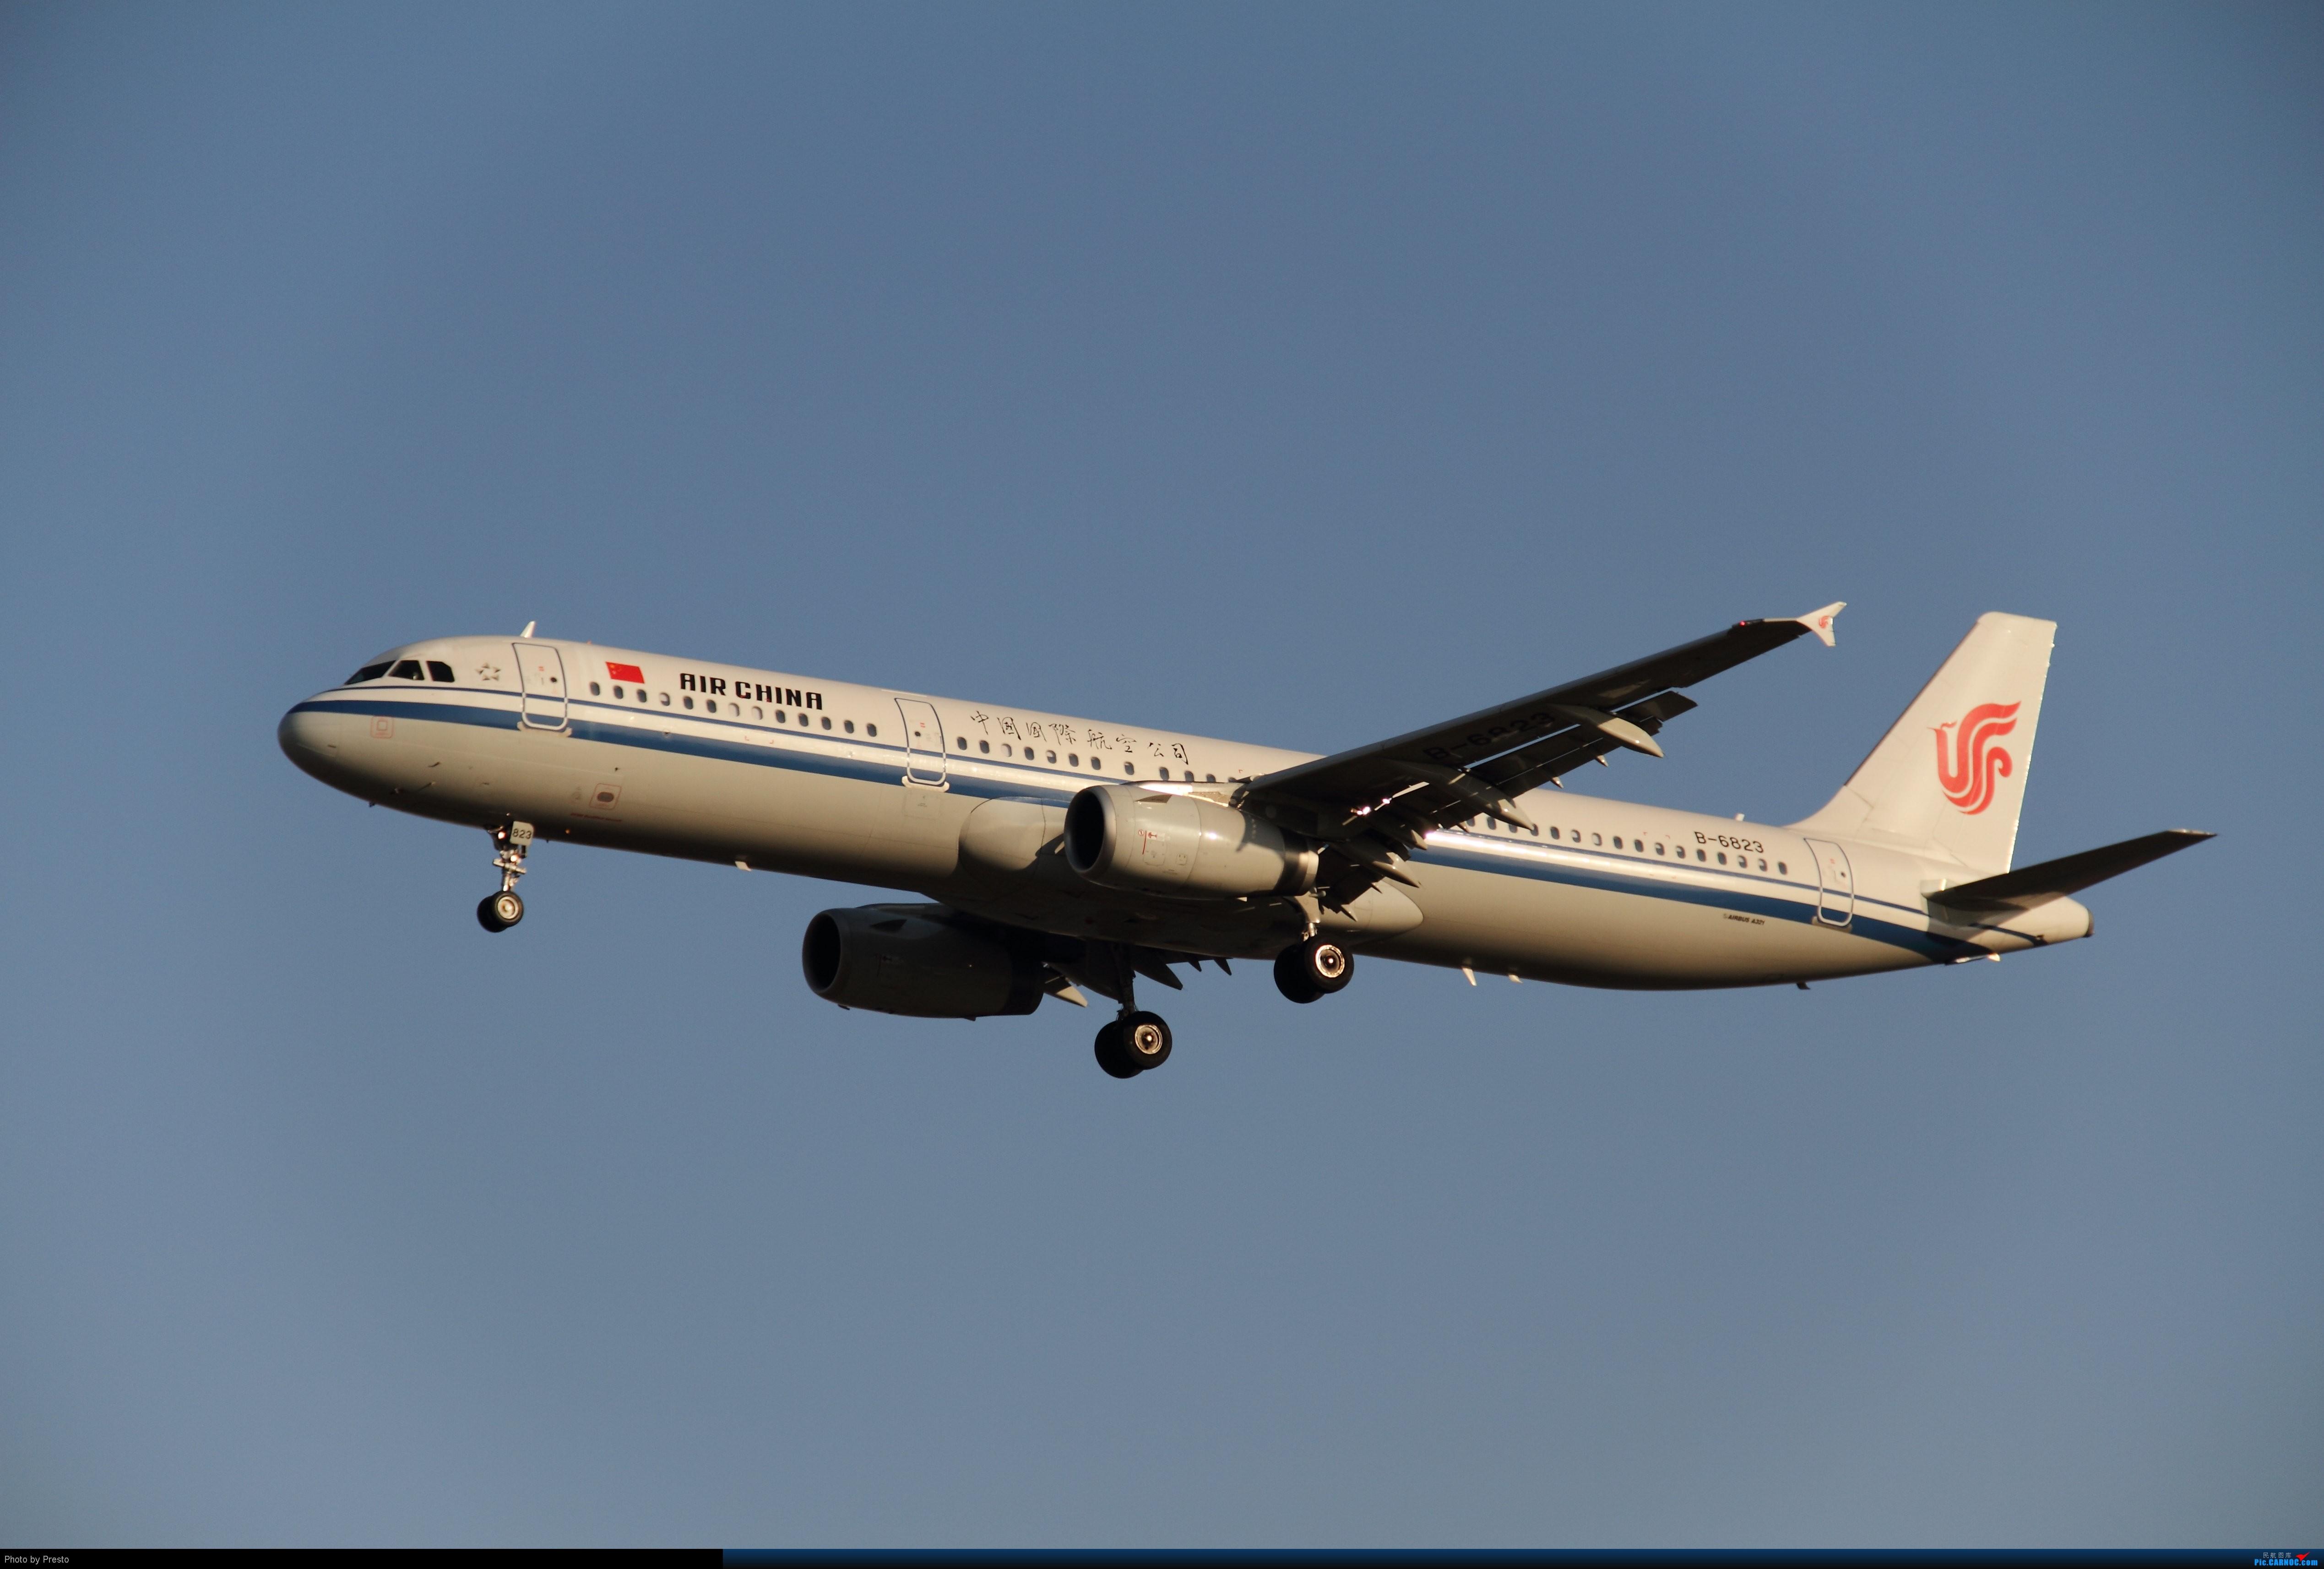 Re:[原创]2.2PEK 首次发图 虚心求教 AIRBUS A321-200 B-6823 中国北京首都机场